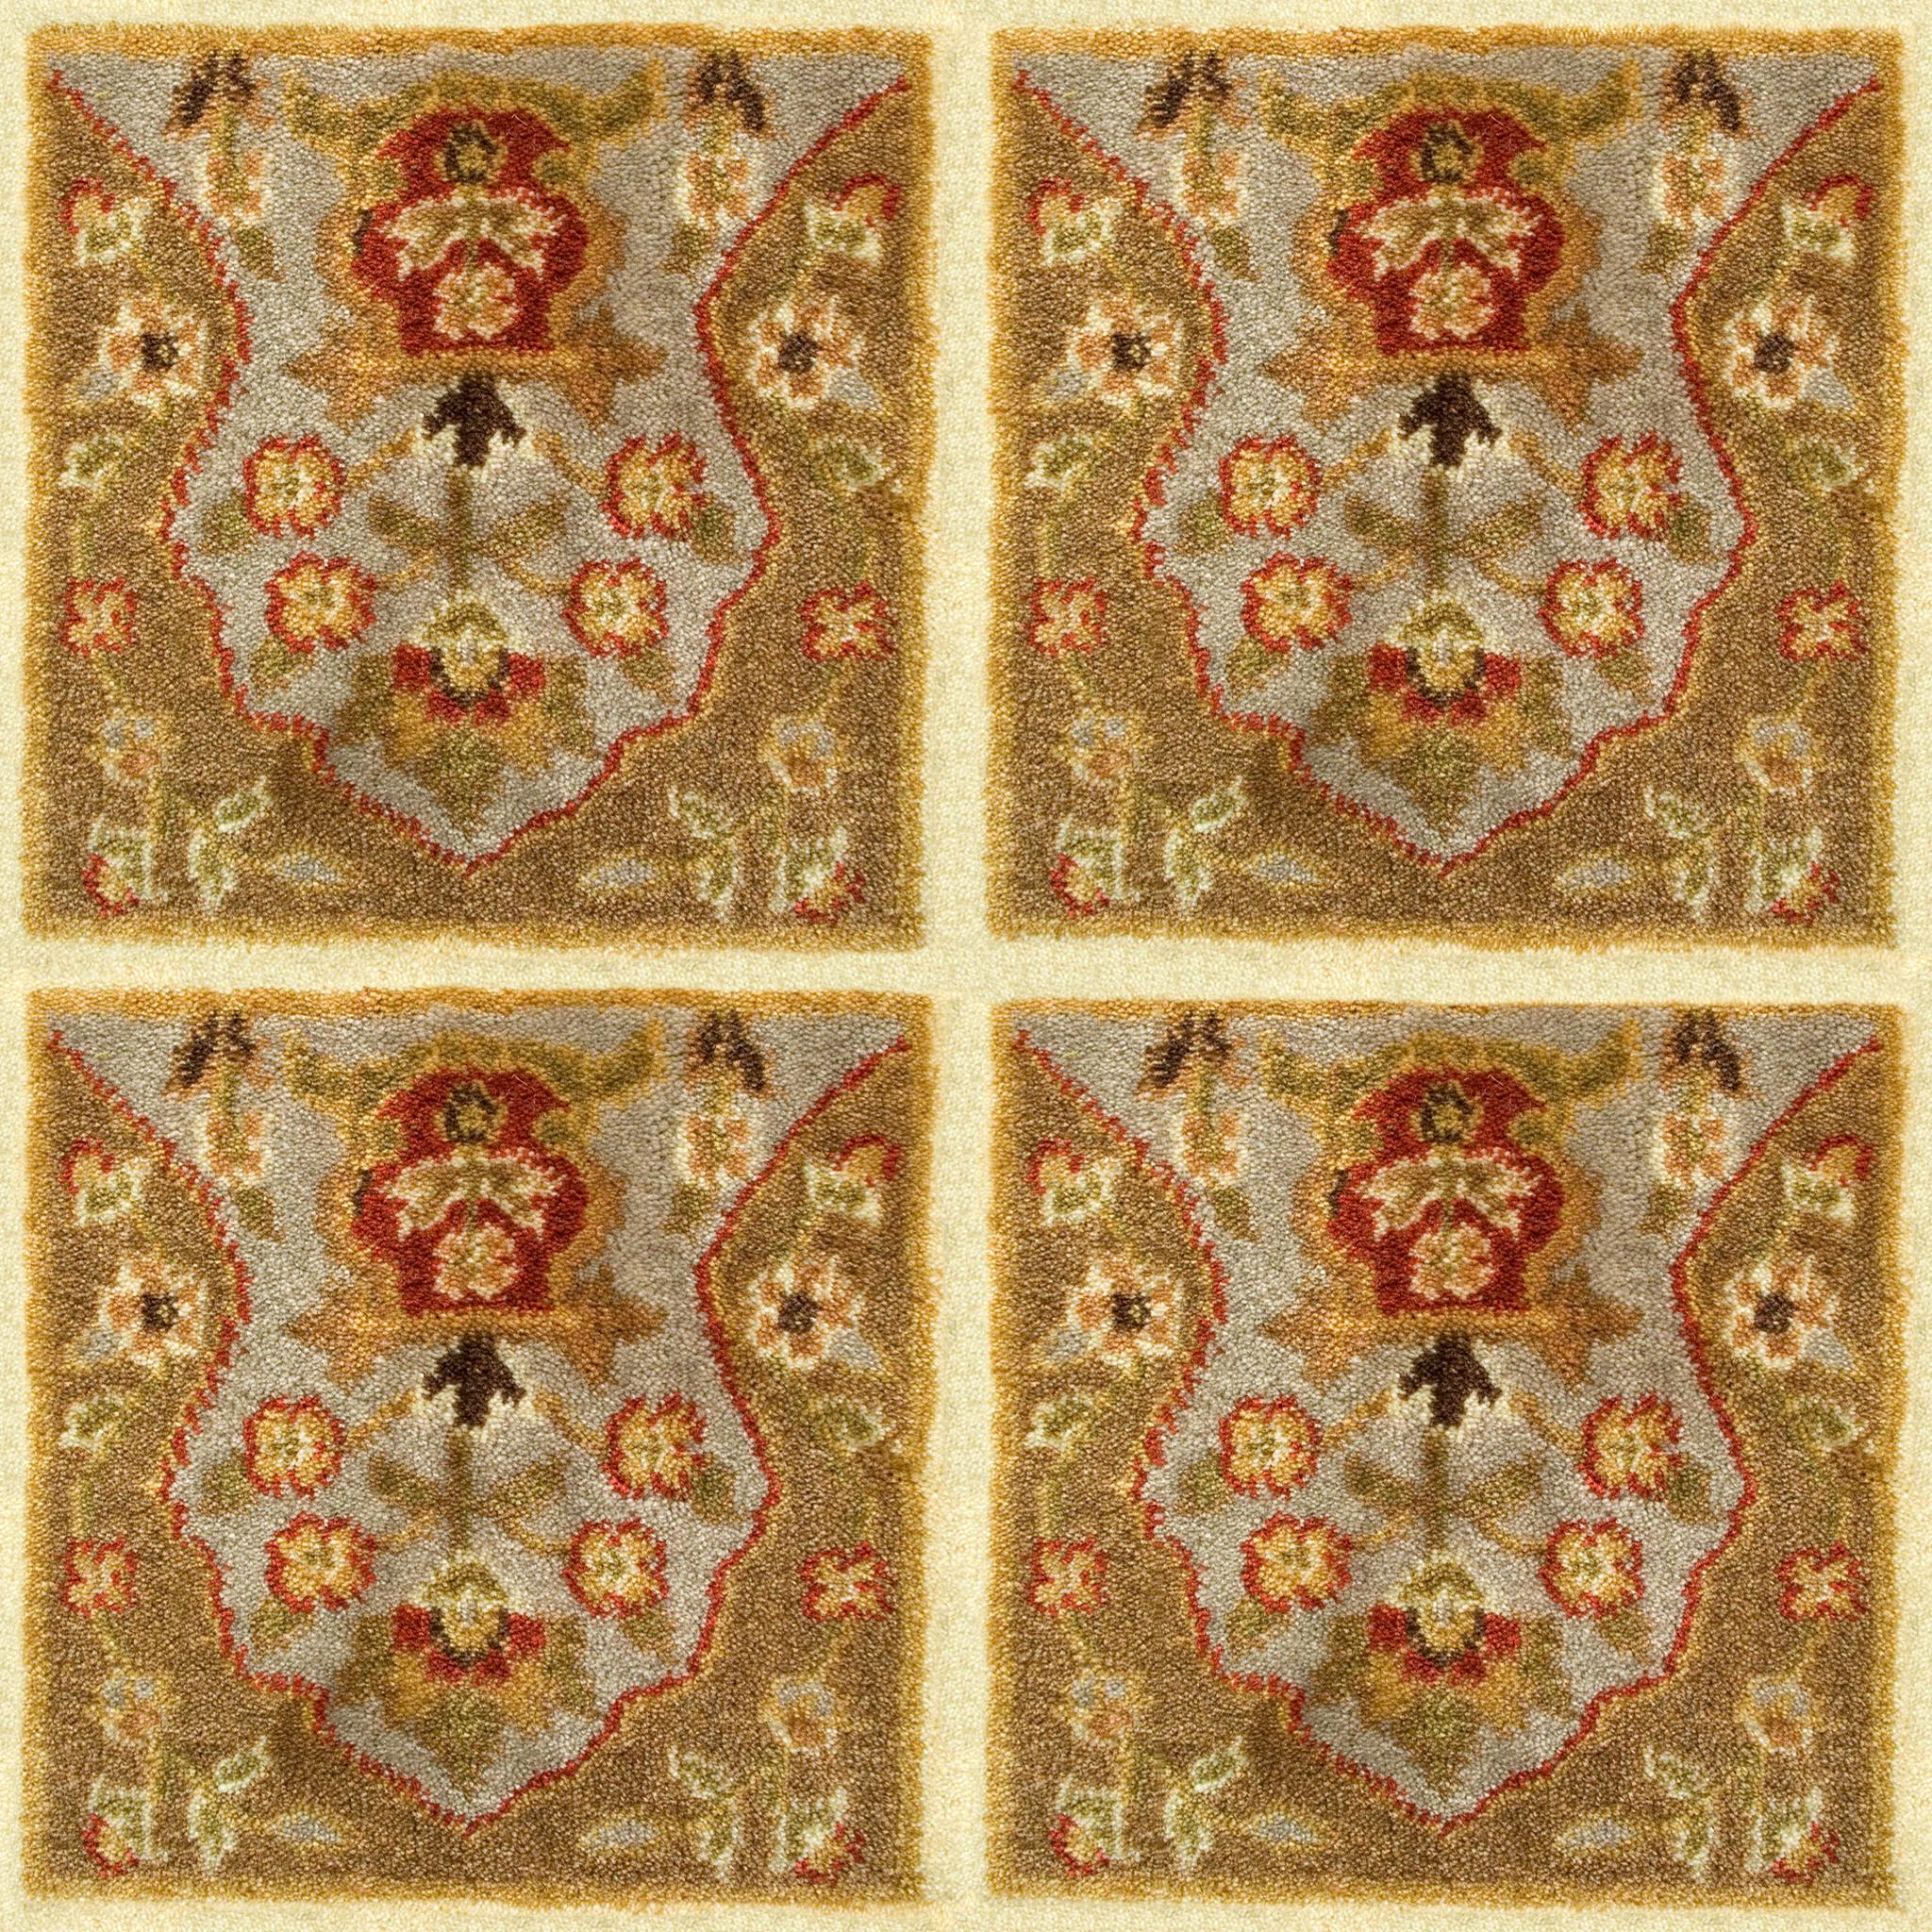 Floral Crowns Carpet.jpg